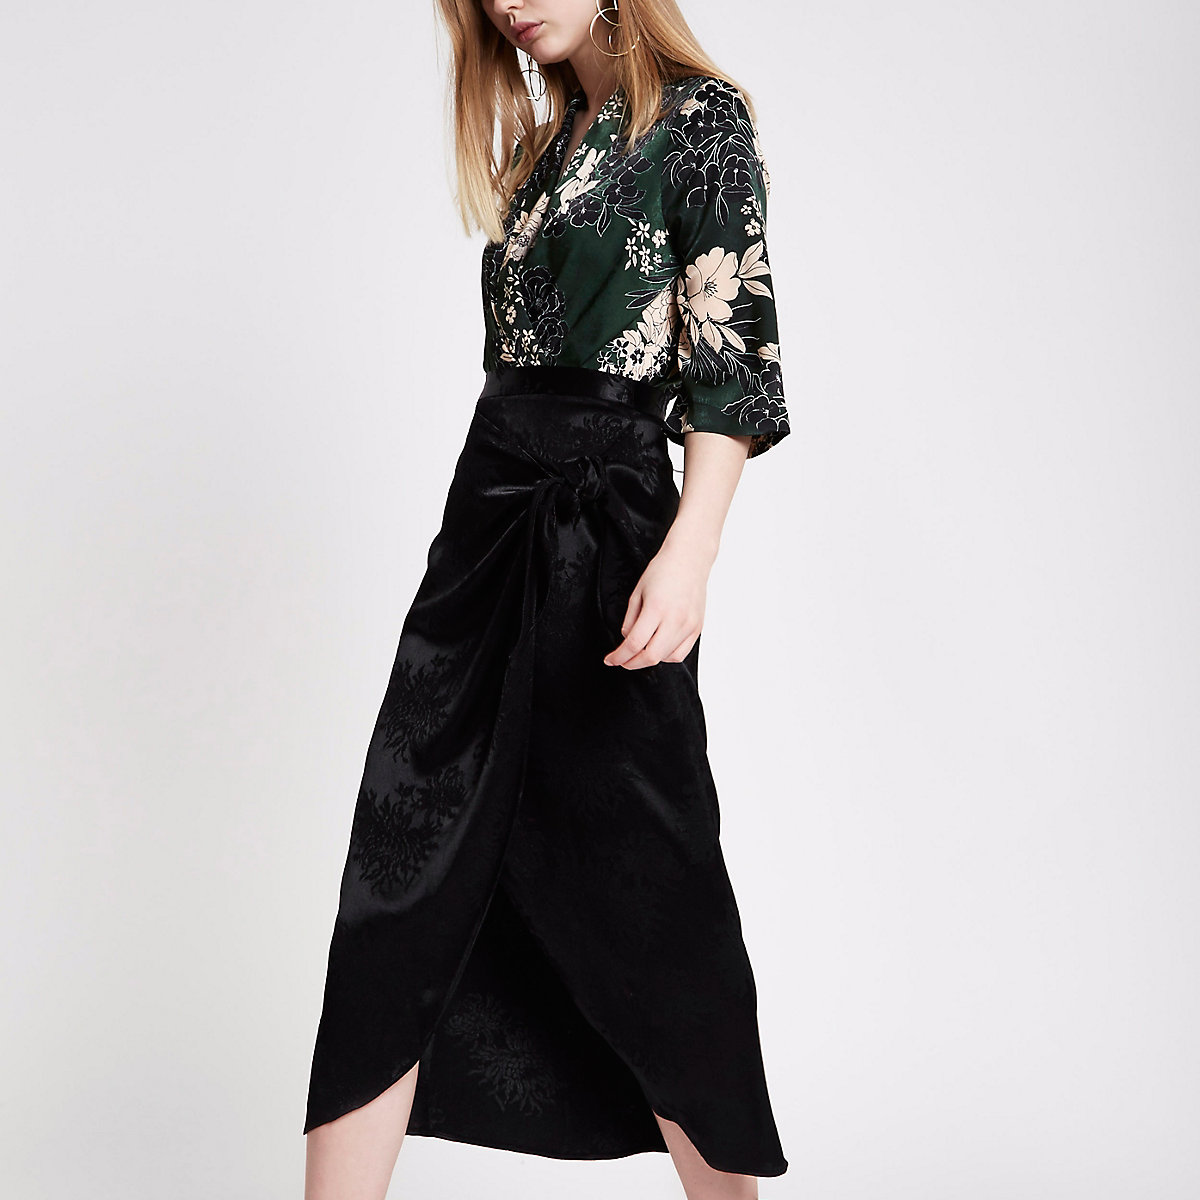 Black satin jacquard tie front pencil skirt